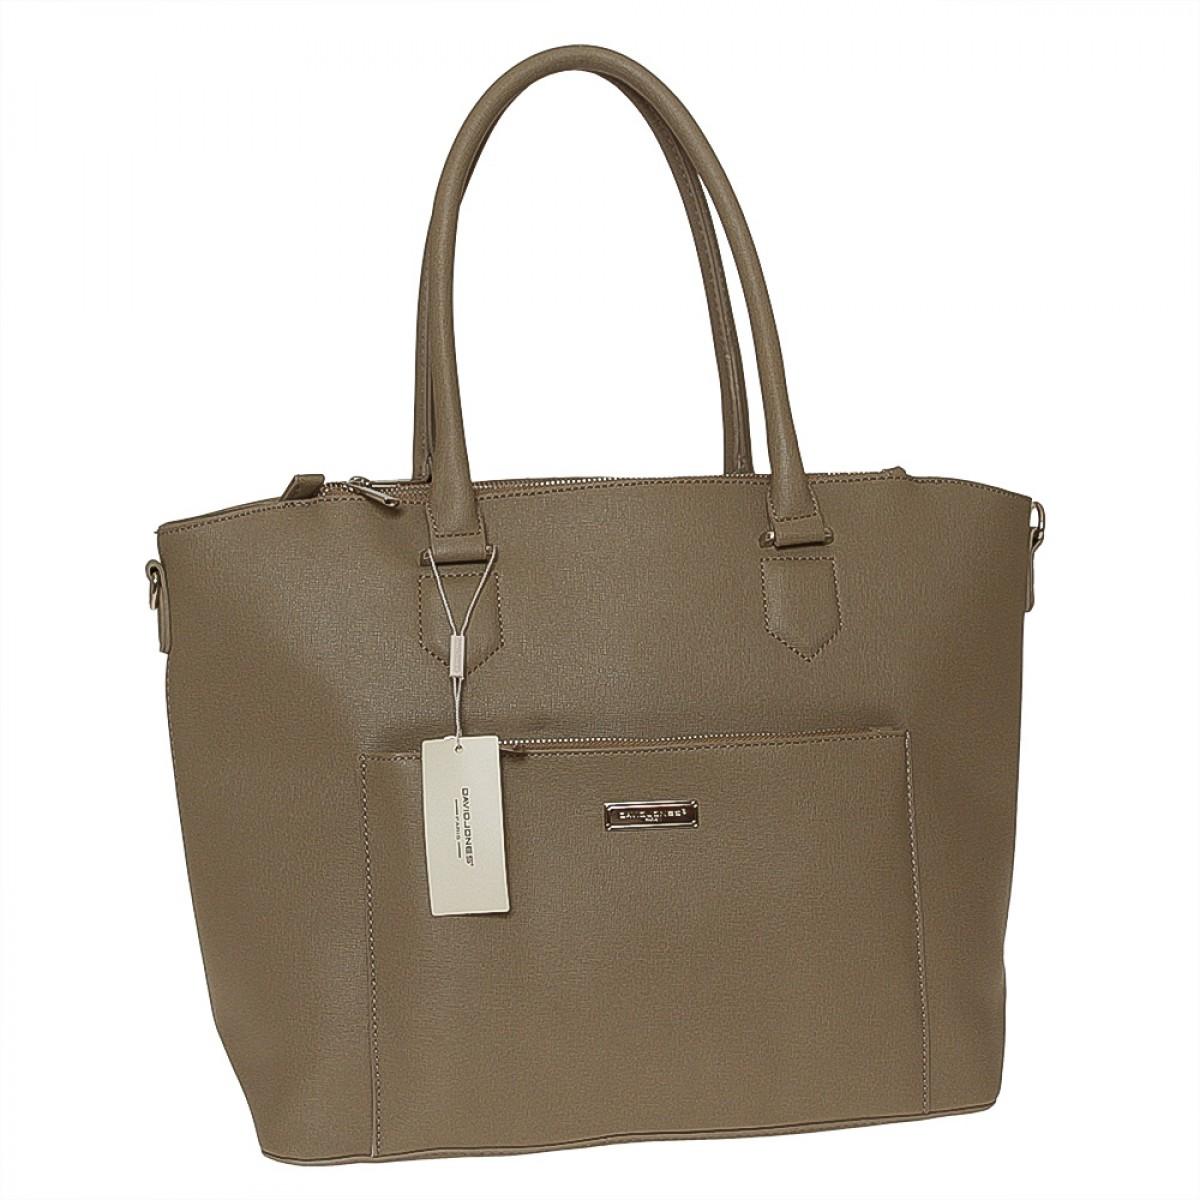 Жіноча сумка David Jones  5226-2 D.CAMEL